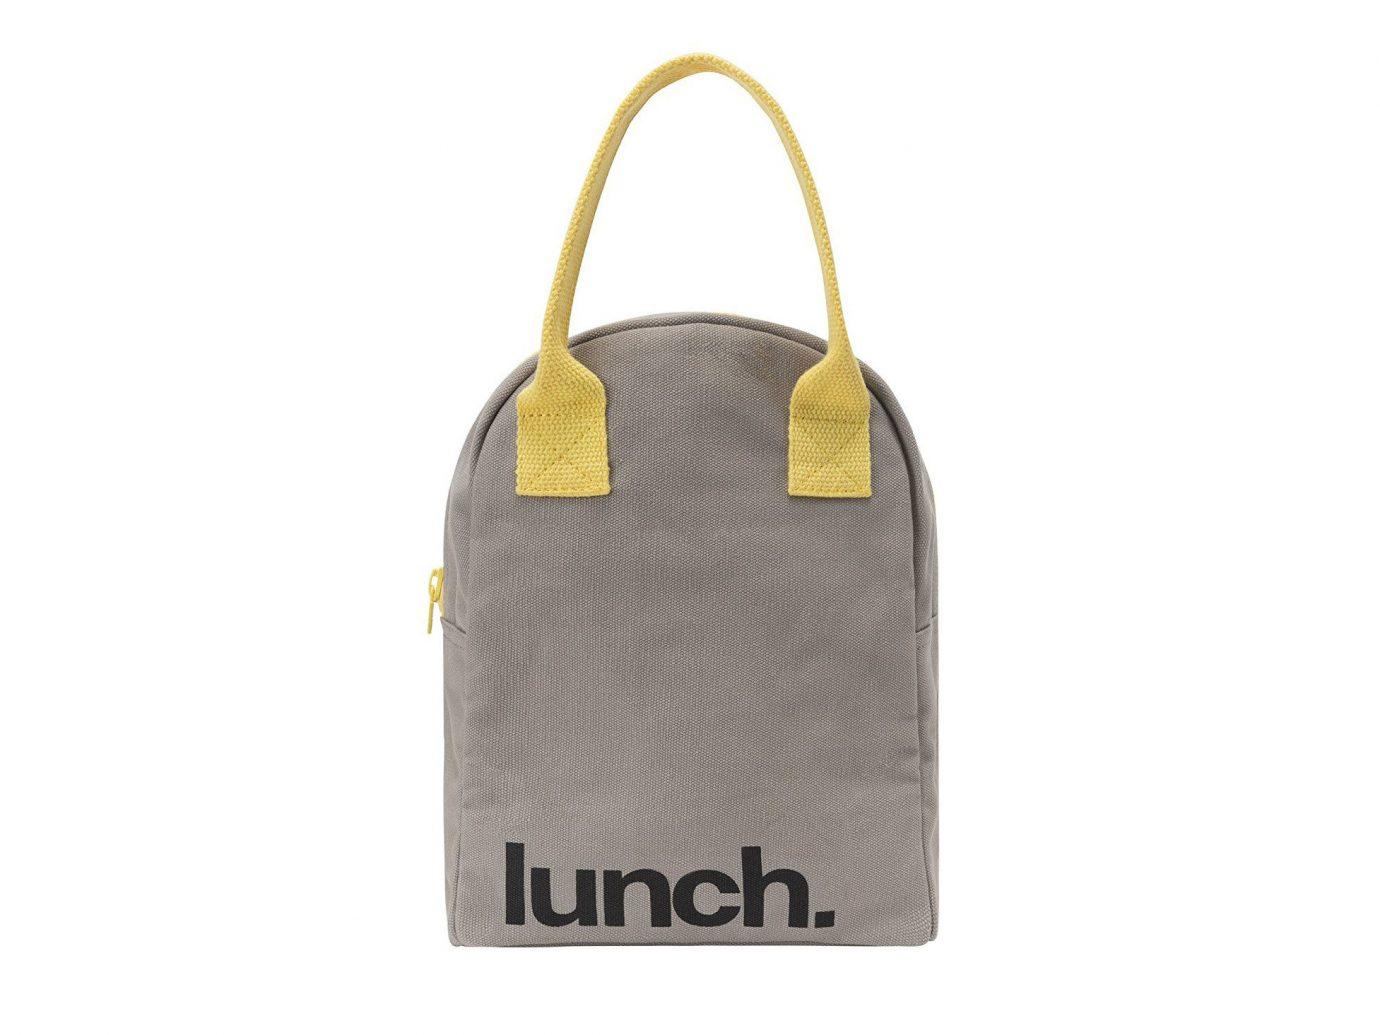 Travel Shop bag handbag yellow shoulder bag product accessory beige product design brand